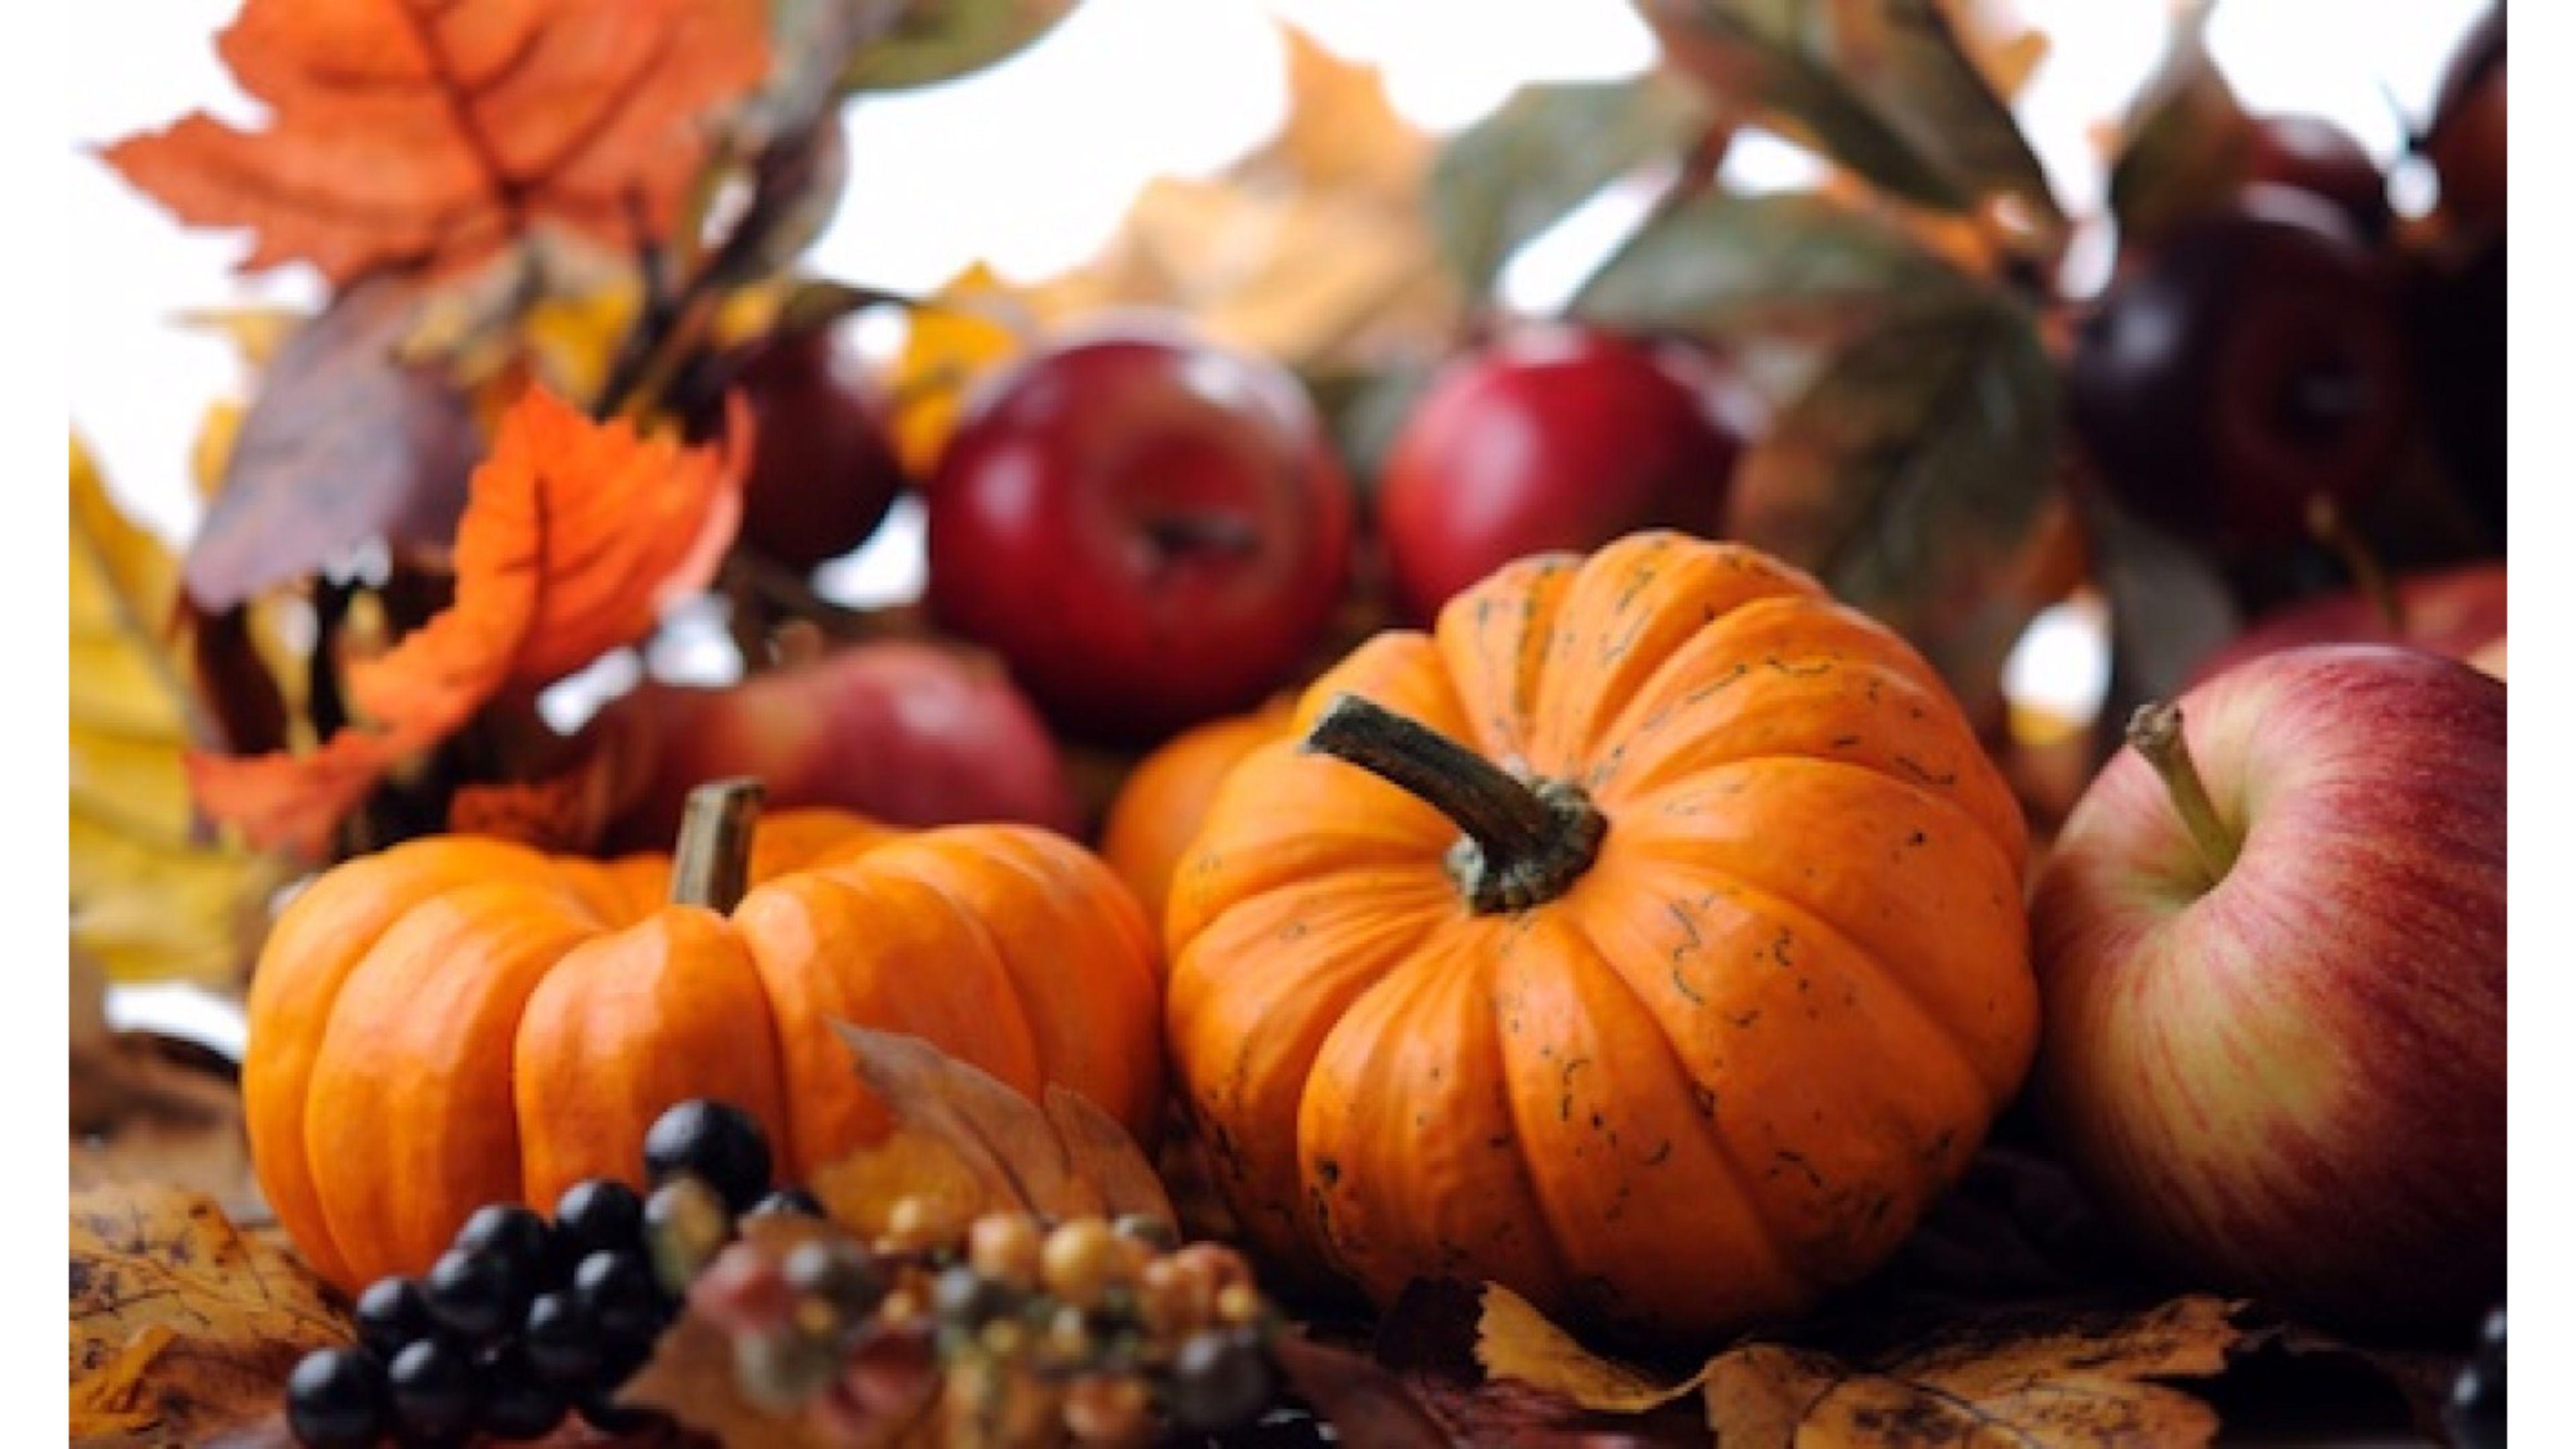 autumn pumpkin wallpaper hd galleryimageco